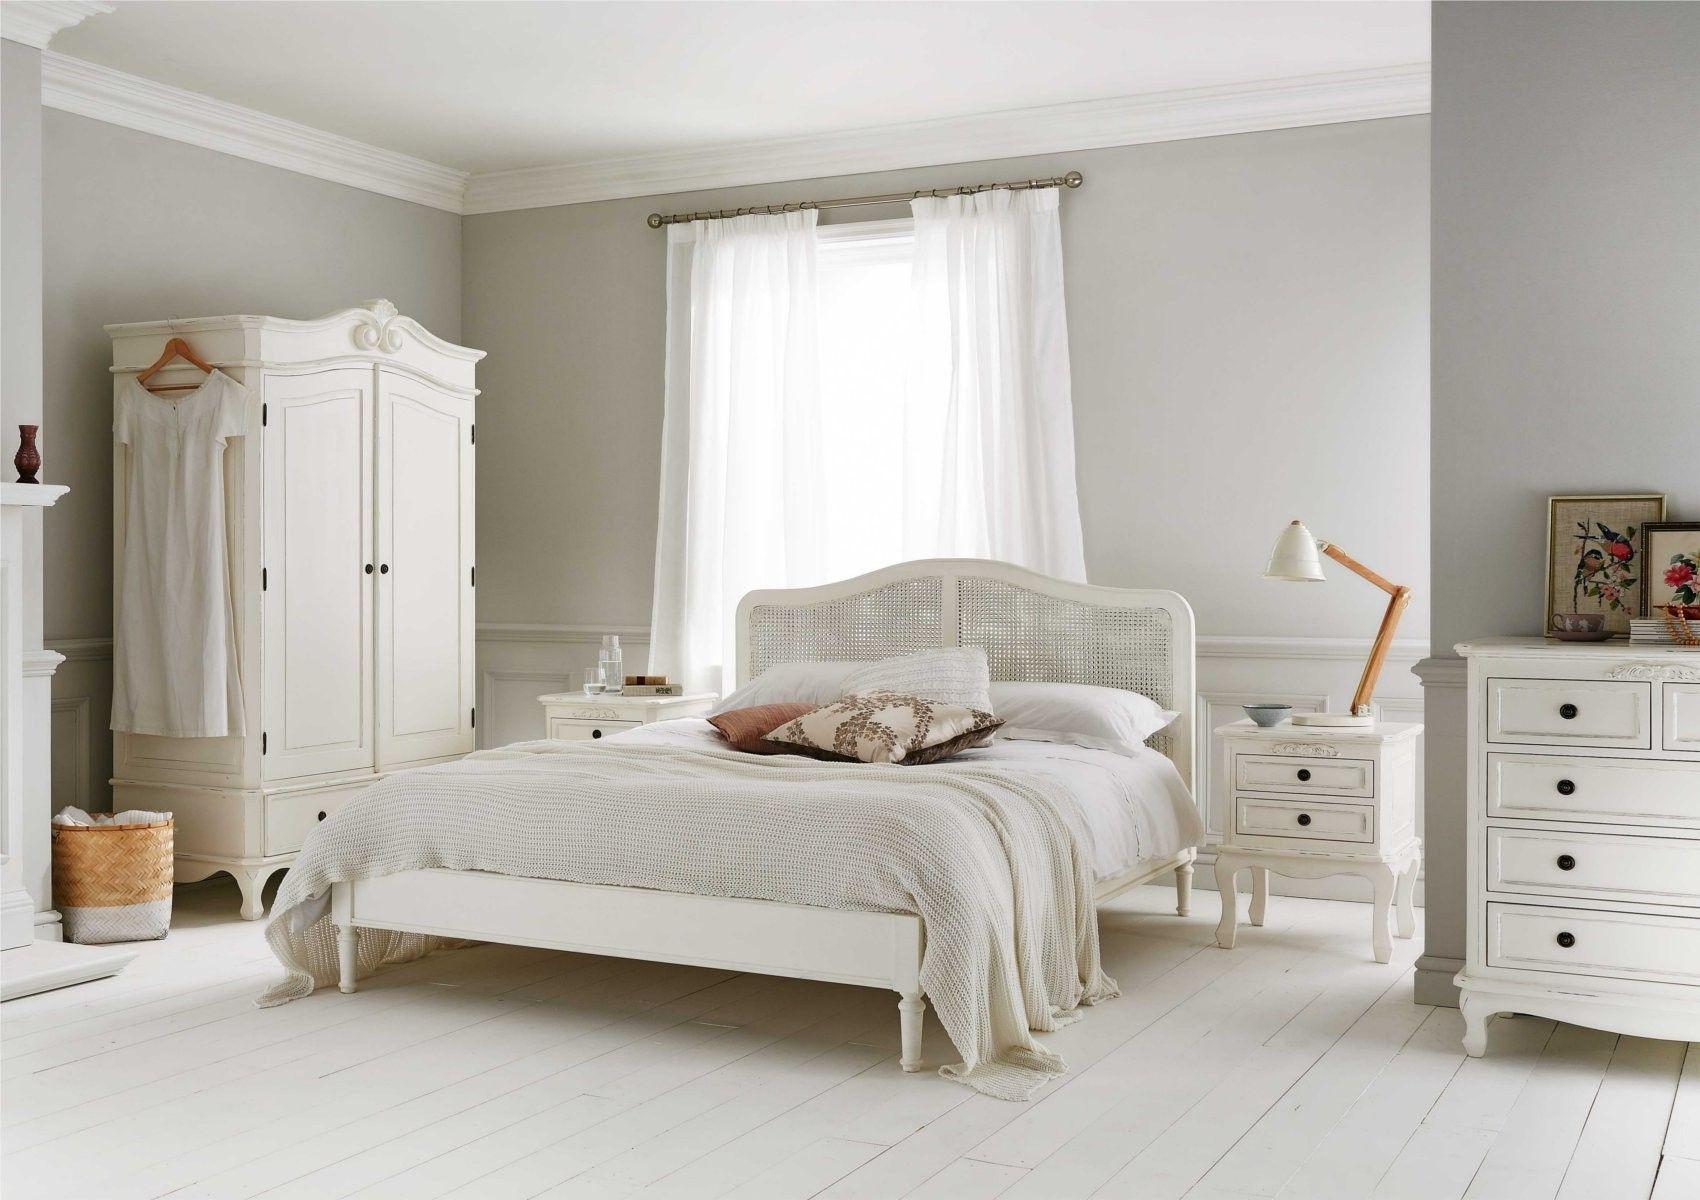 Bedrooms Furnitures Designs Best Bed Designs Ideas: Best 25+ Wooden Bed Designs Ideas On Pinterest